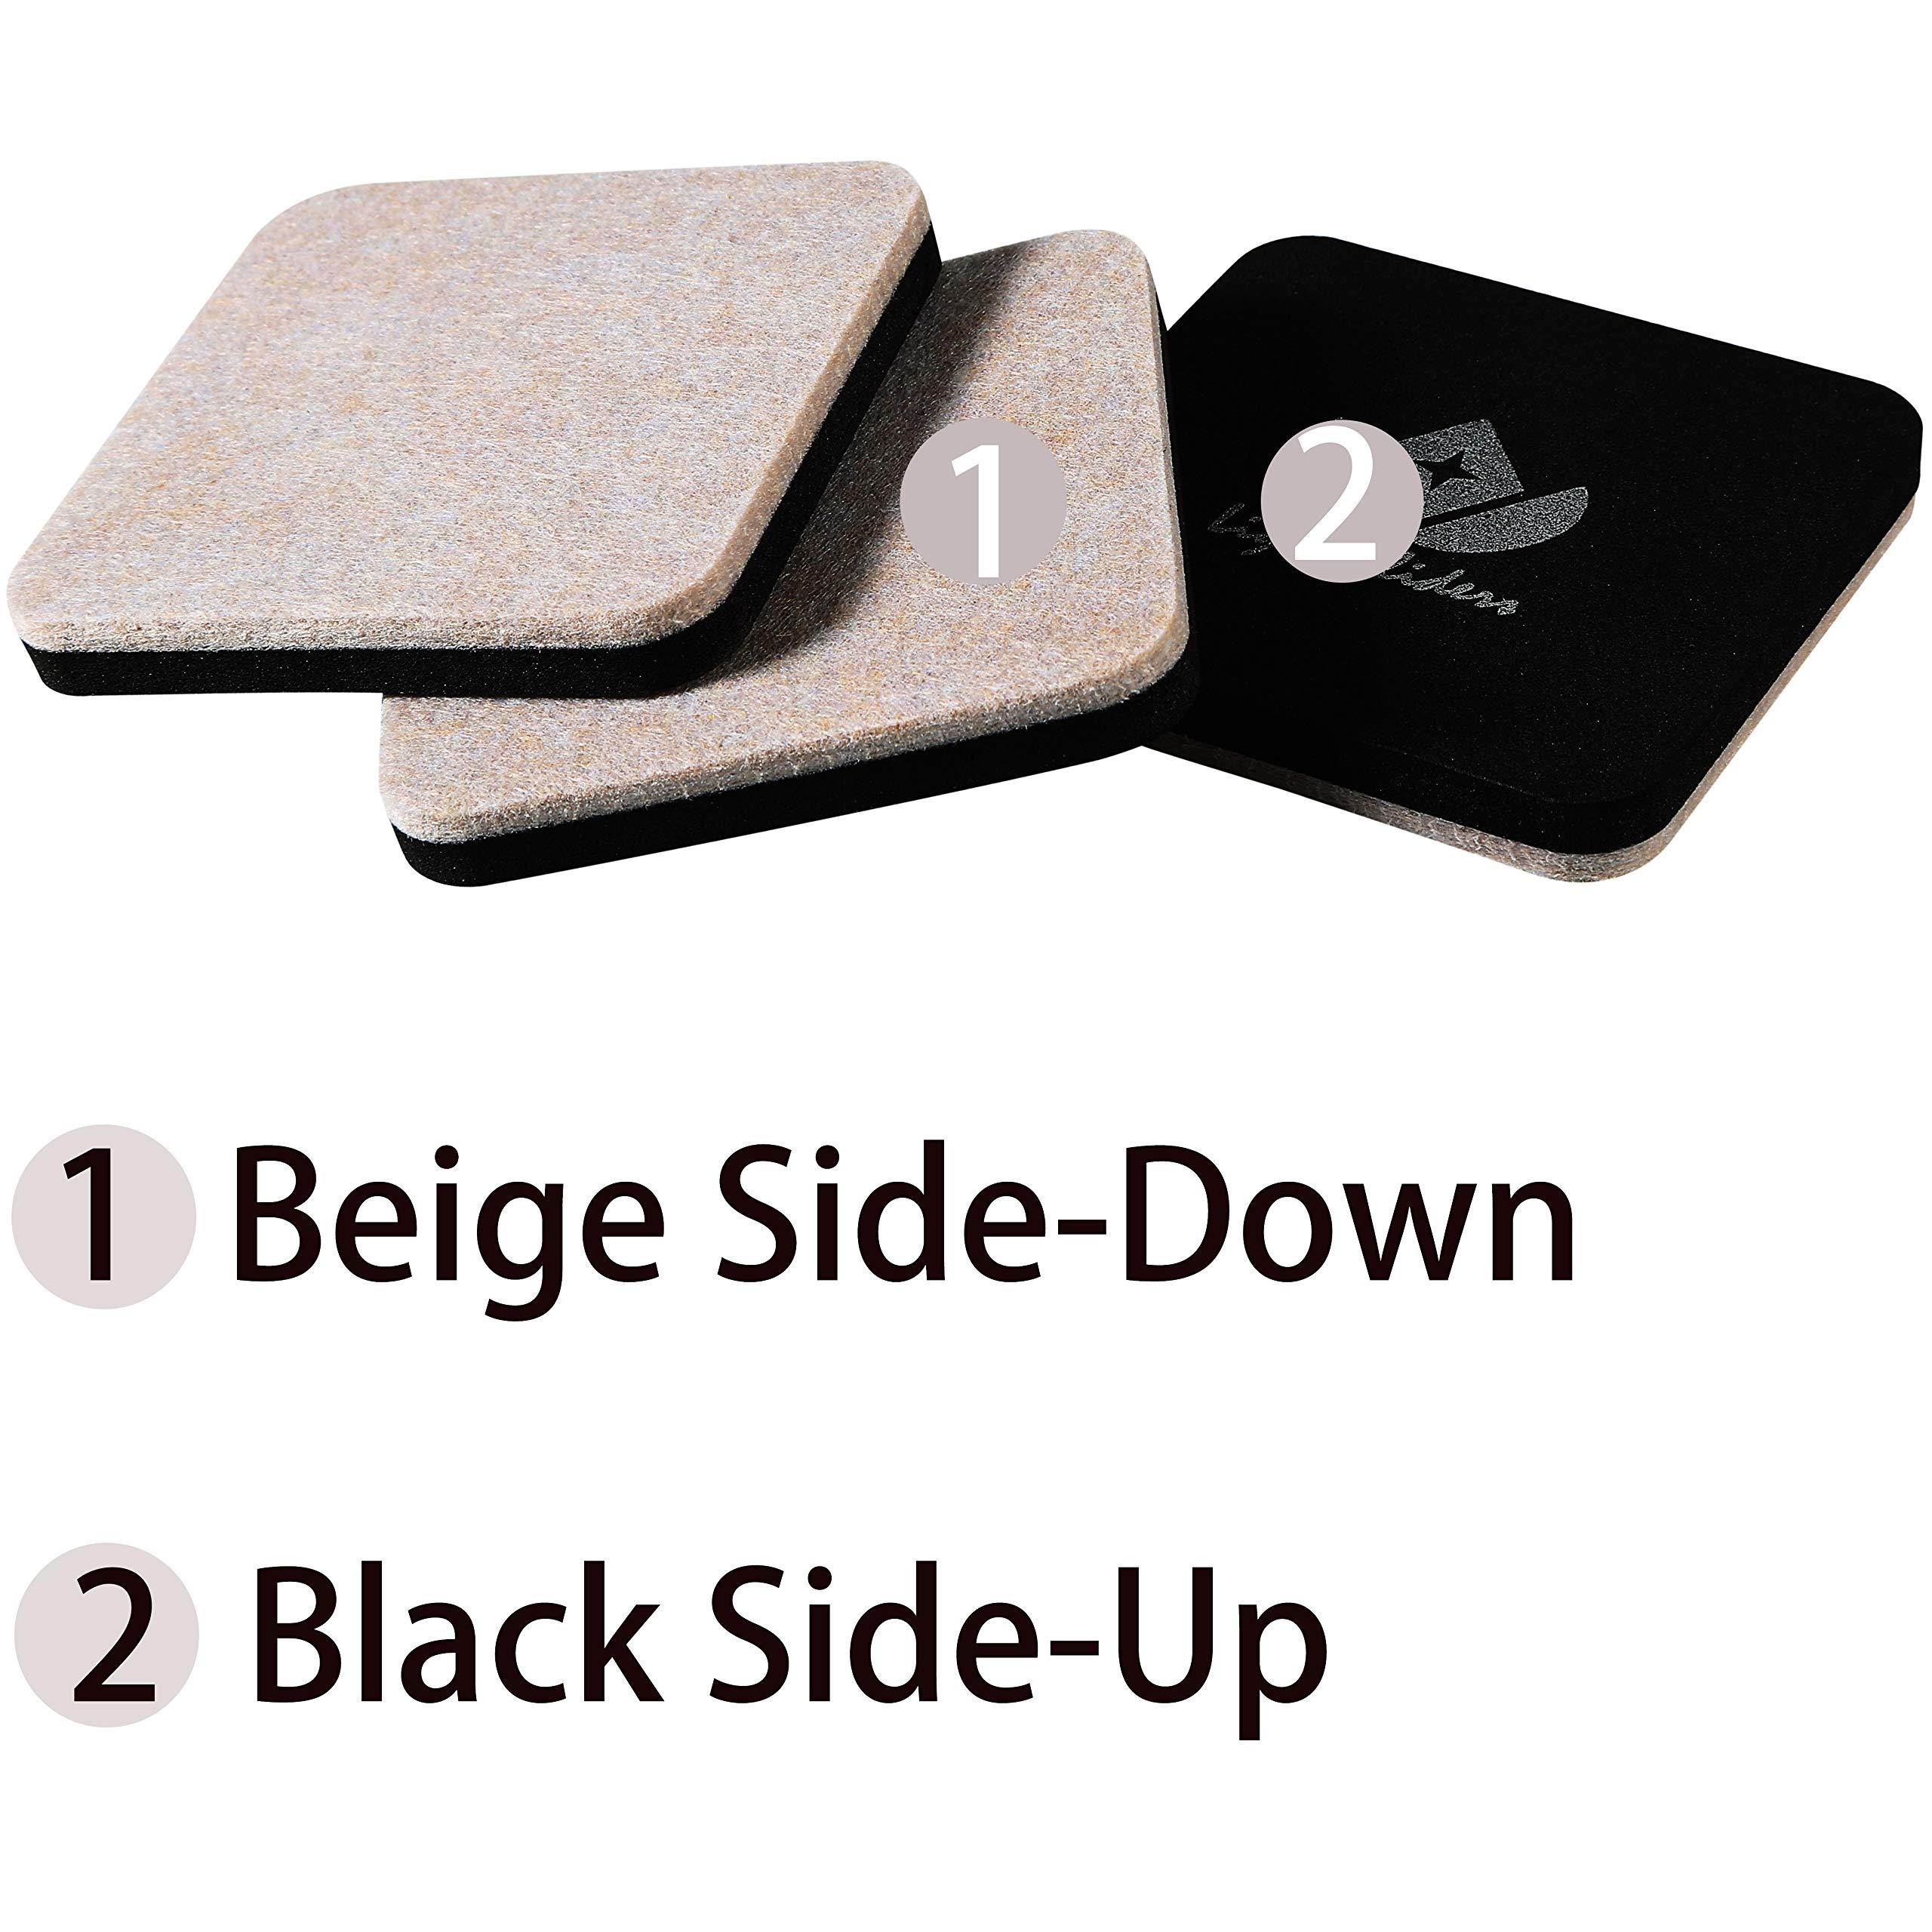 Liyic 4in.Square 16 Pack Felt Sliders for Hard Surfaces-Felt Furniture Sliders - Heavy Duty Sliders - Reusable Hardwood Floor Sliders -Furniture Moving Sliders-Sofa Sliders Gliders Glides Movers by Liyic (Image #3)